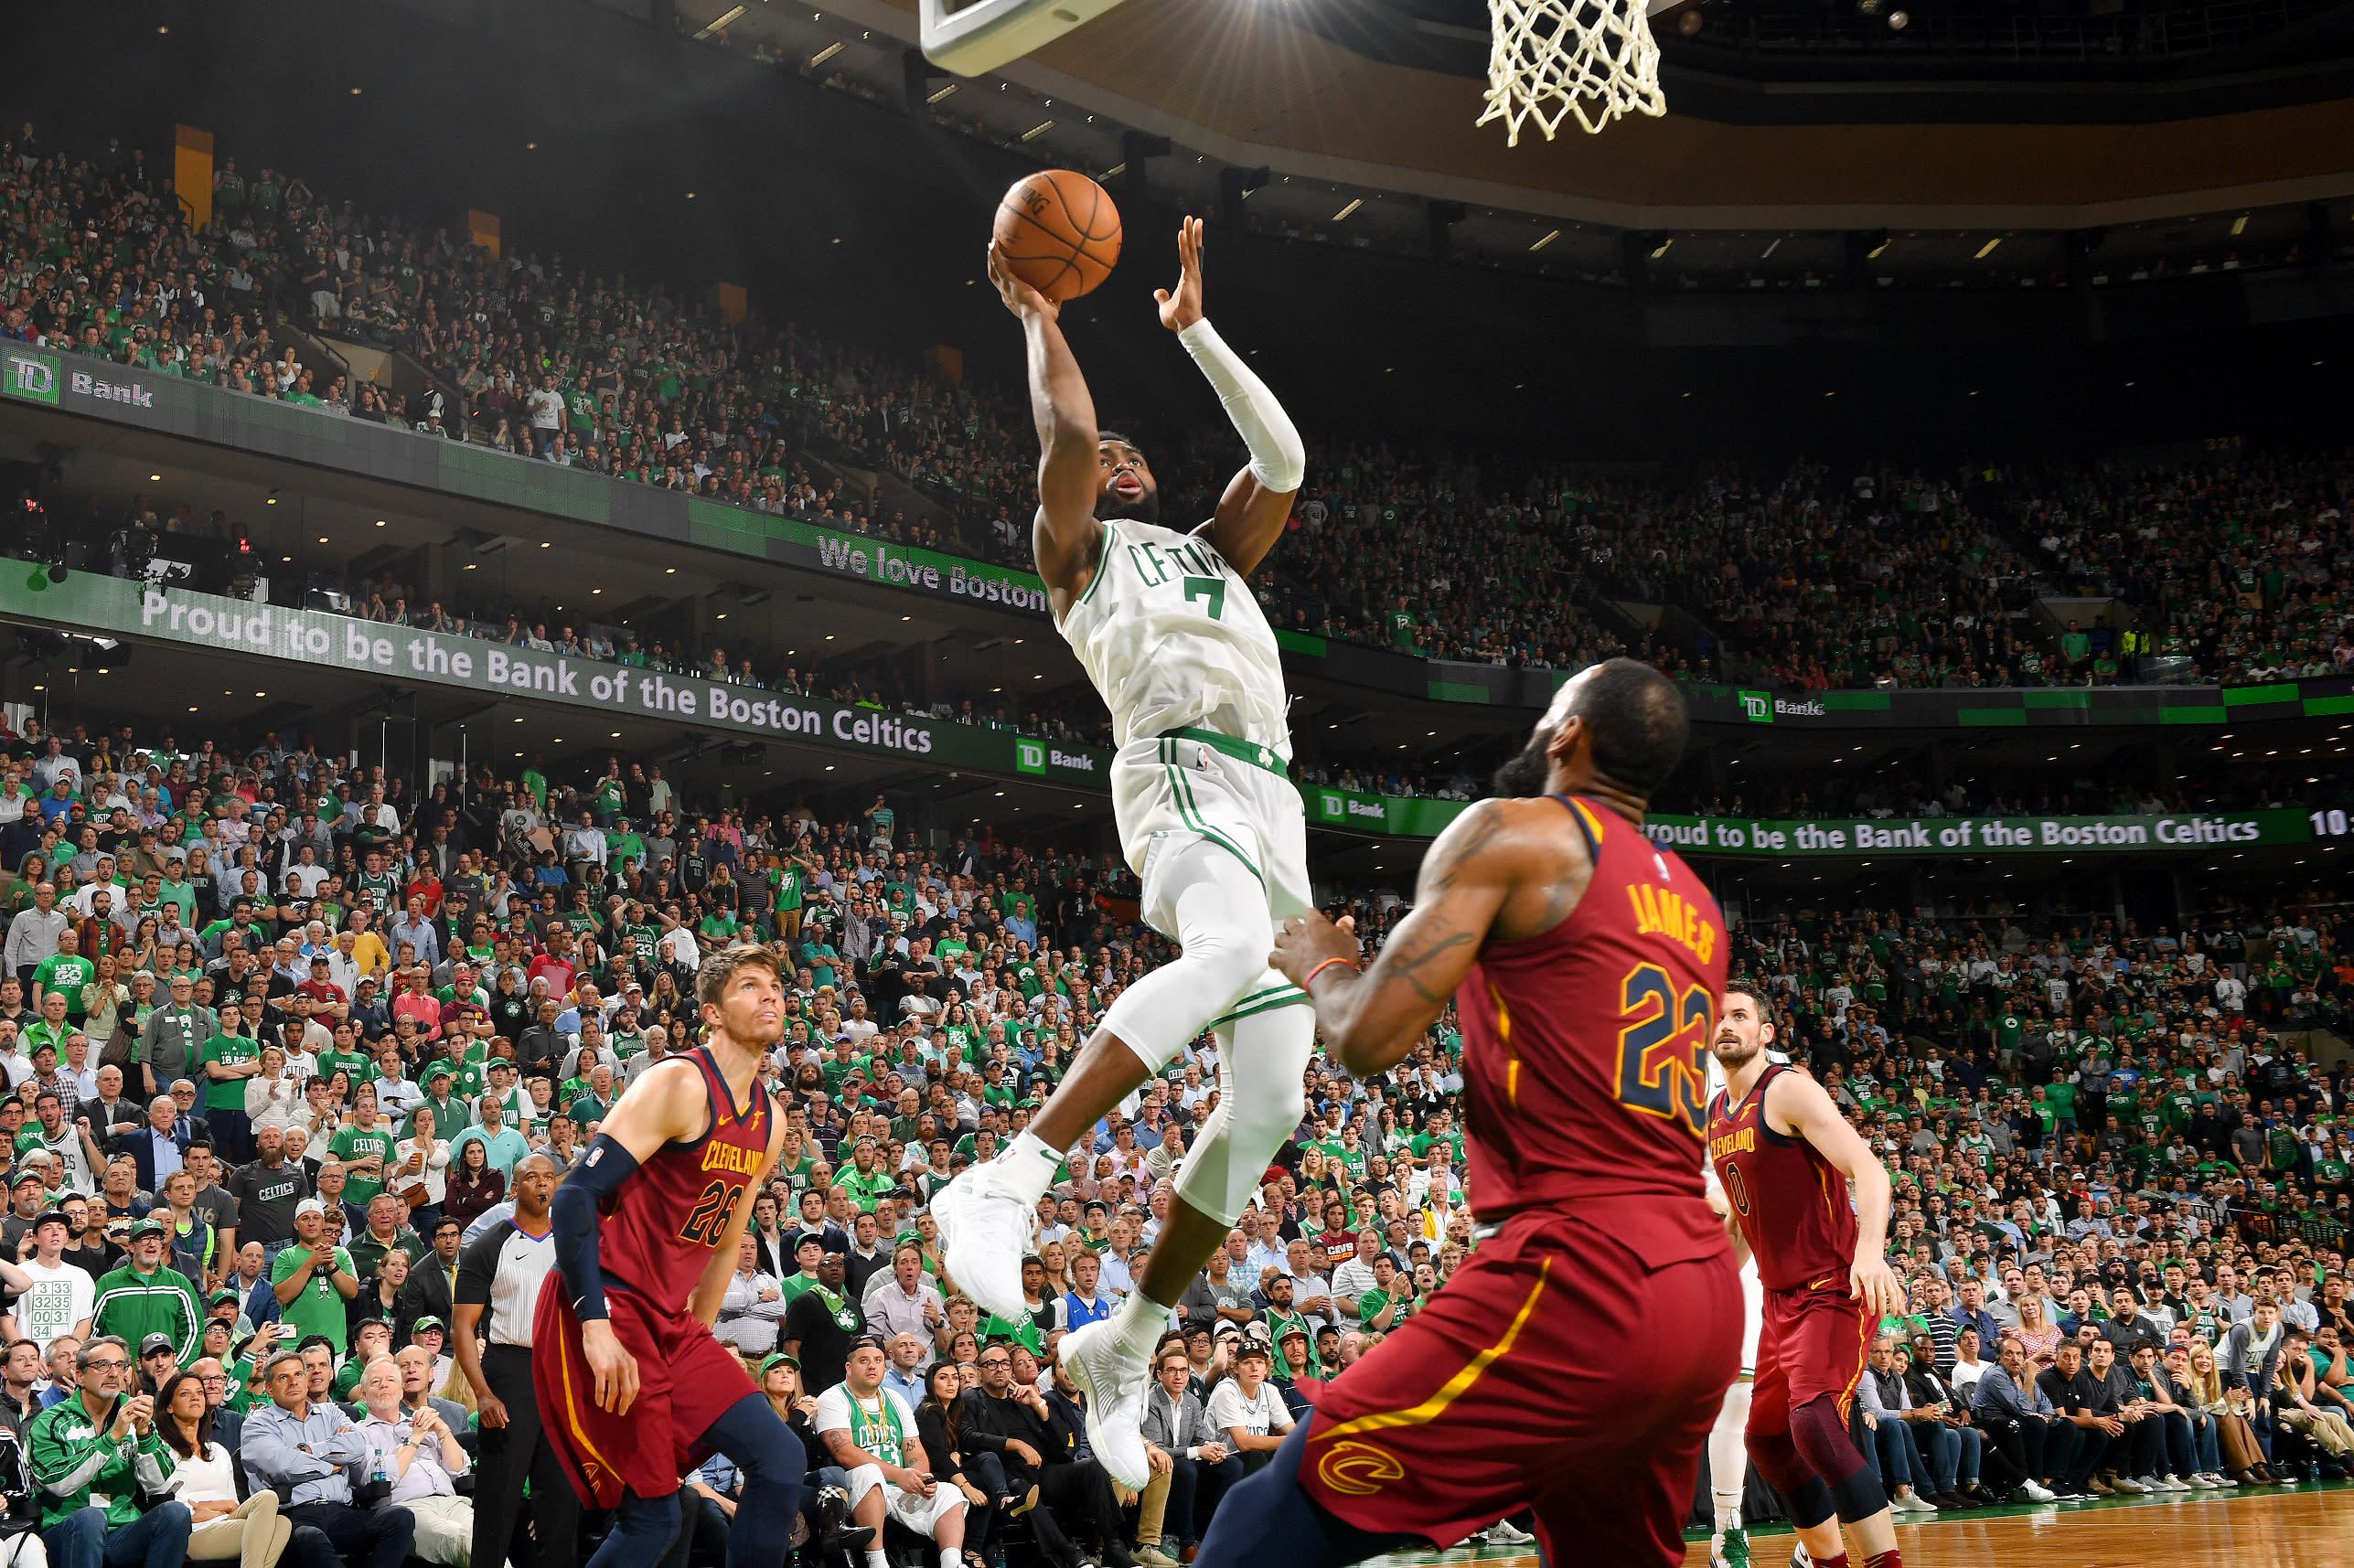 ac9666e076b The Celtics shook off a 40-point LeBron triple-double to take a 2-0 lead